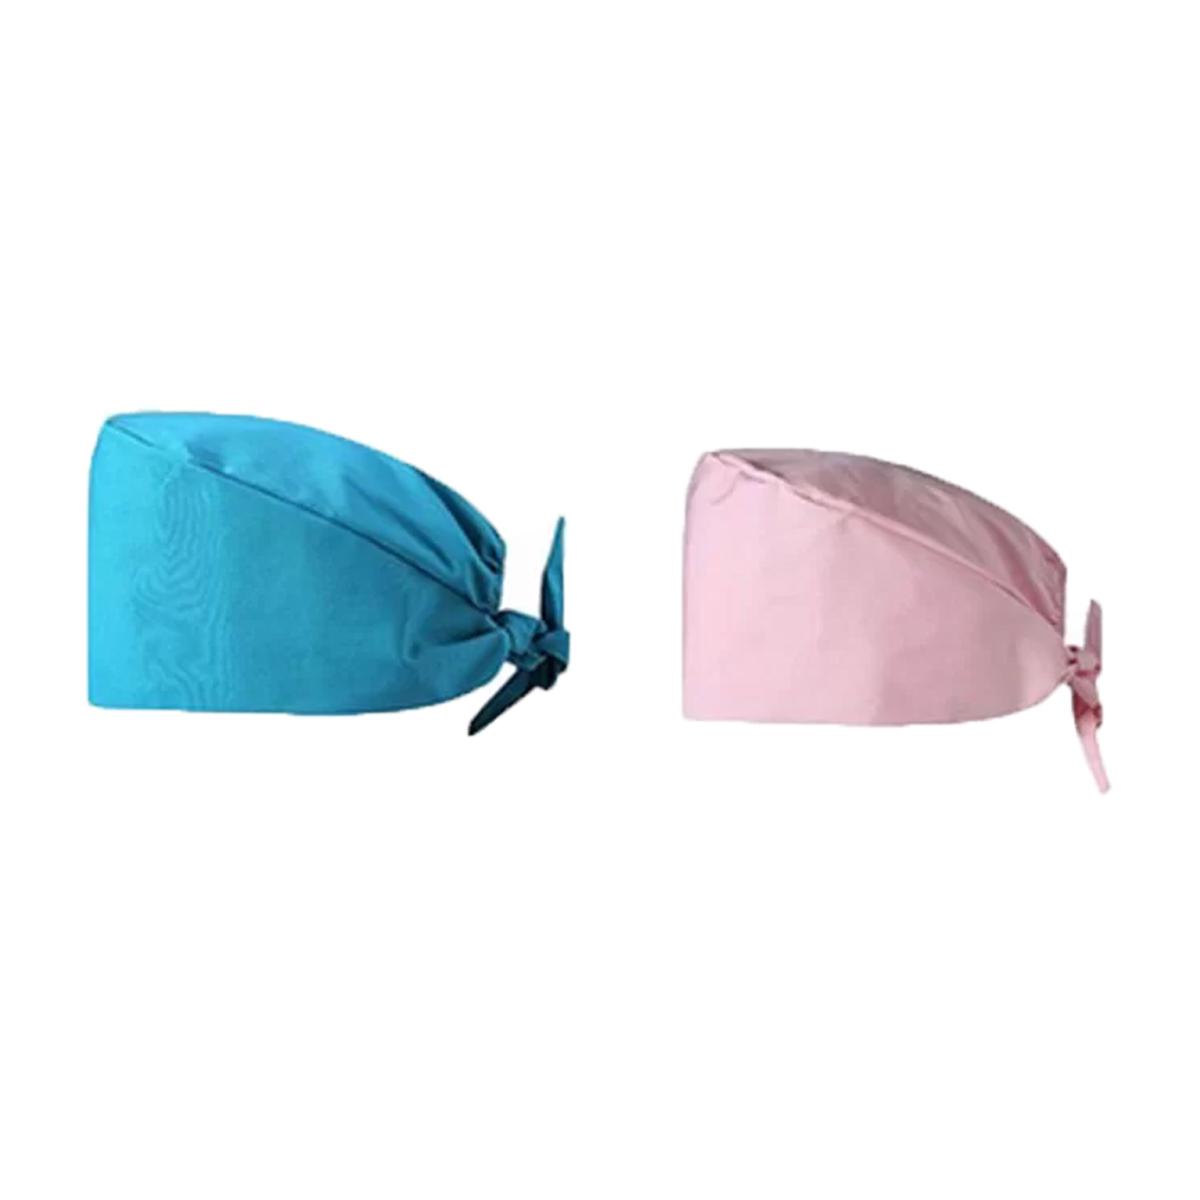 REUSABLE/WASHABLE SURGICAL HAT